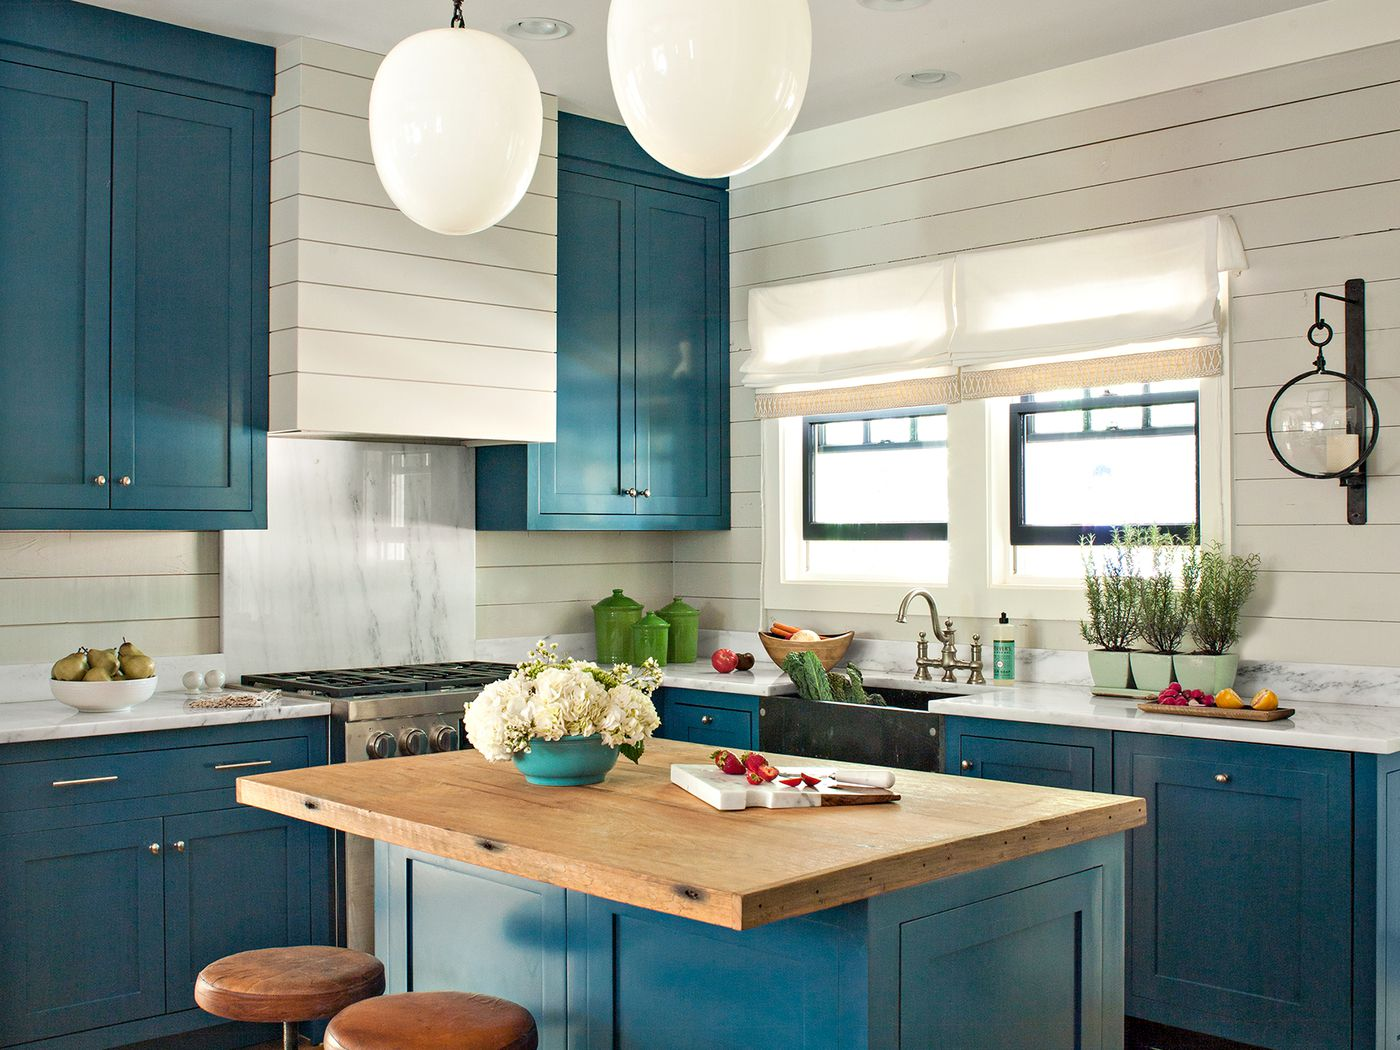 replacing kitchen countertop ideas